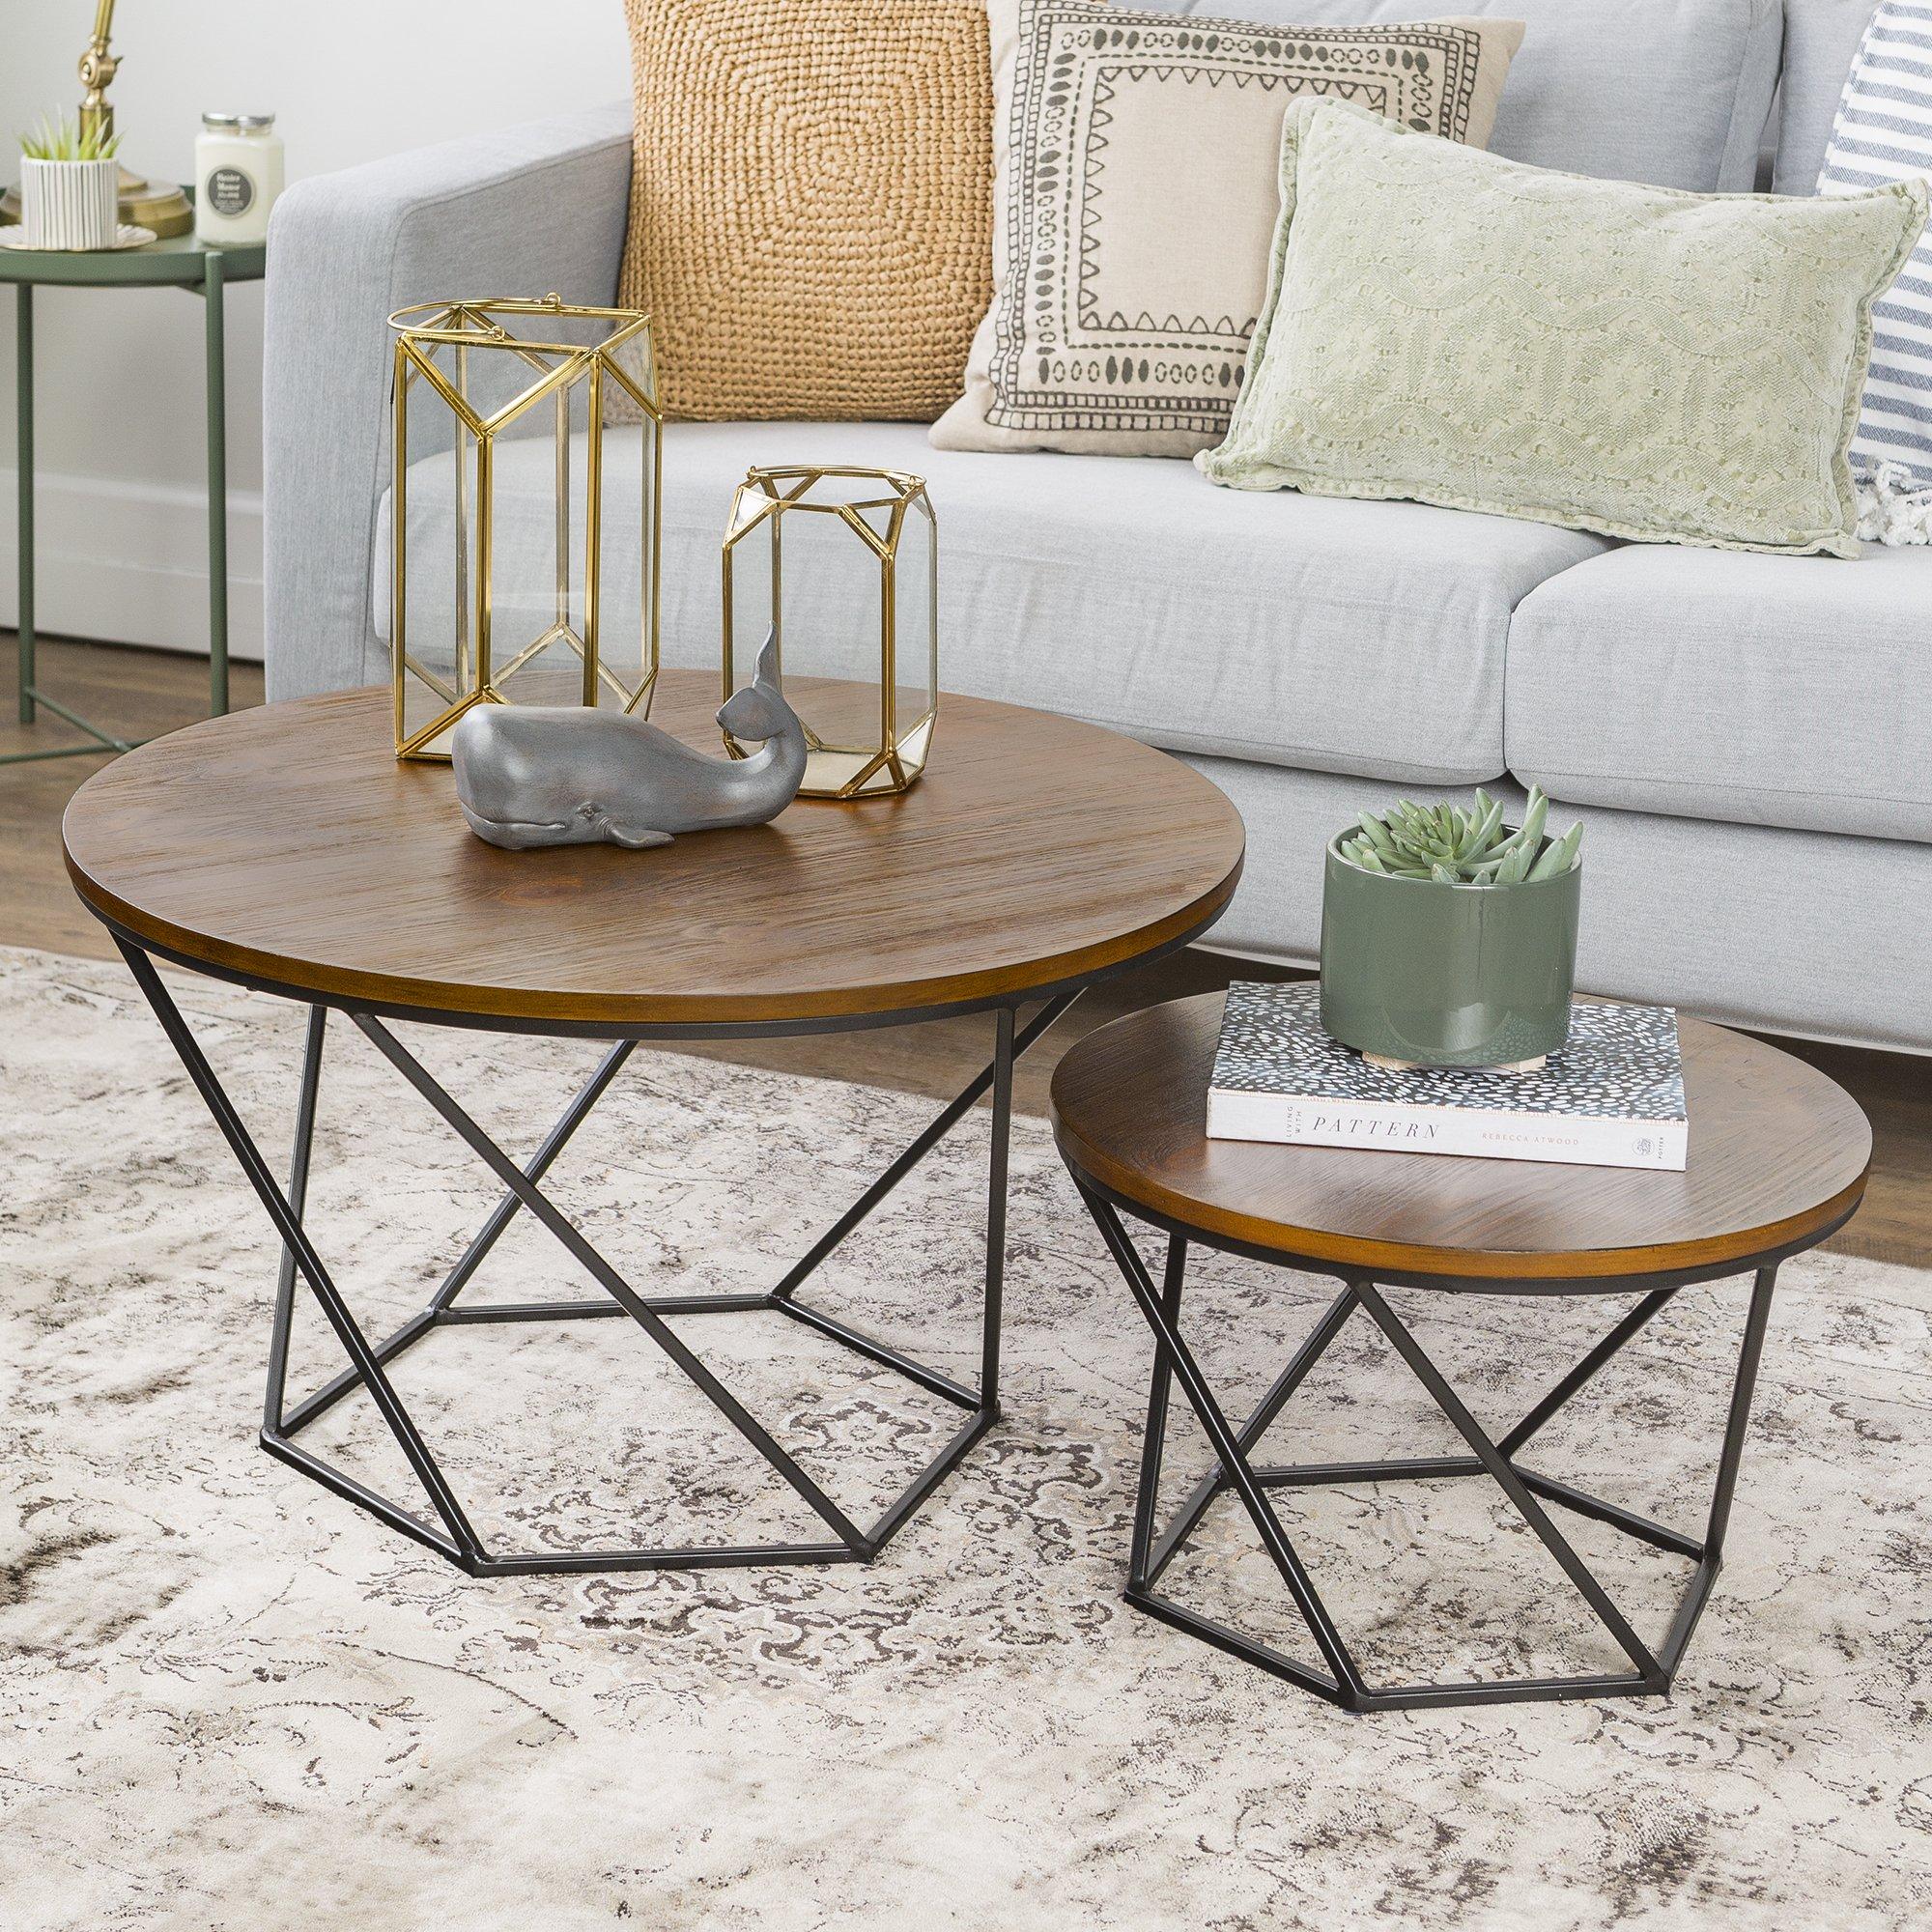 WE Furniture Geometric Wood Nesting Coffee Tables - Oak/Black by WE Furniture (Image #1)